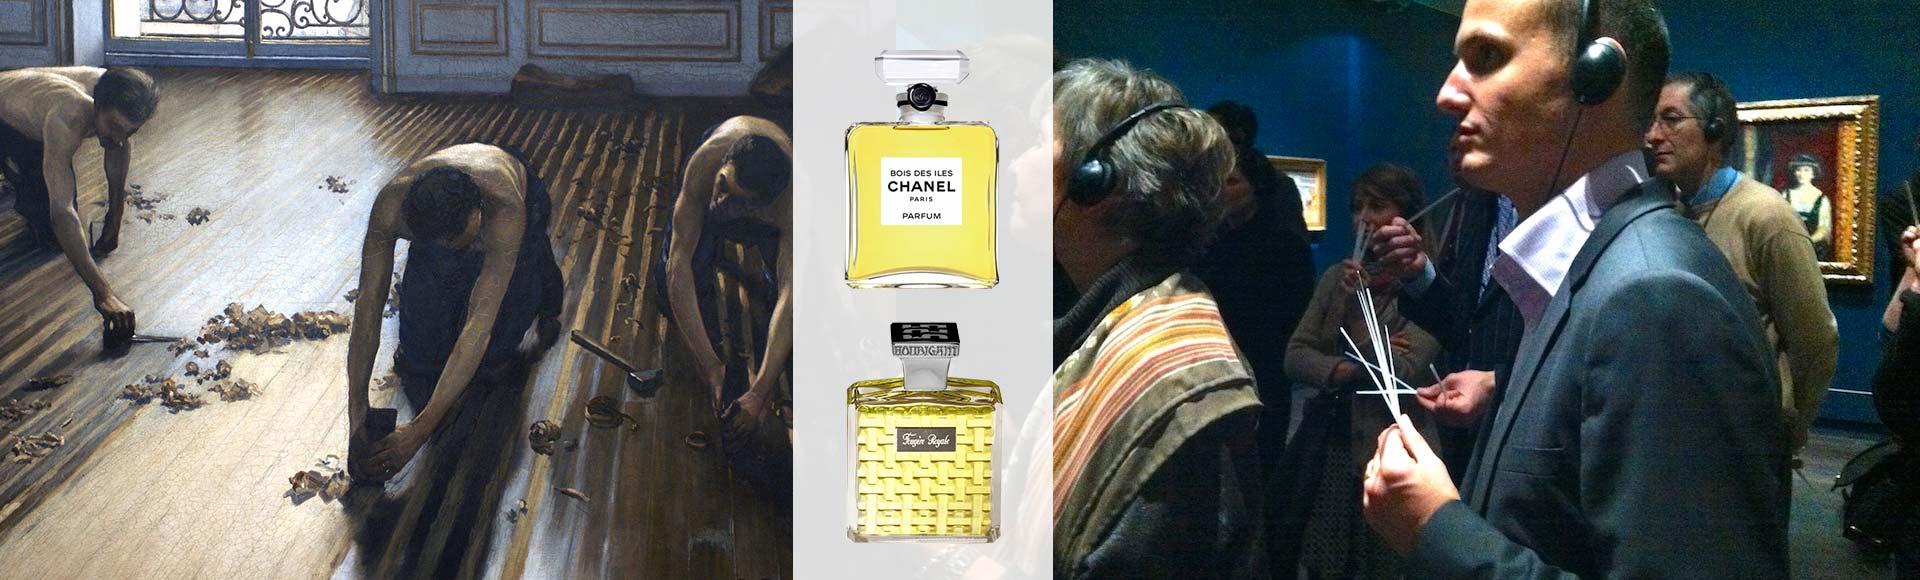 Des effluves et des œuvres - Musée d'Orsay